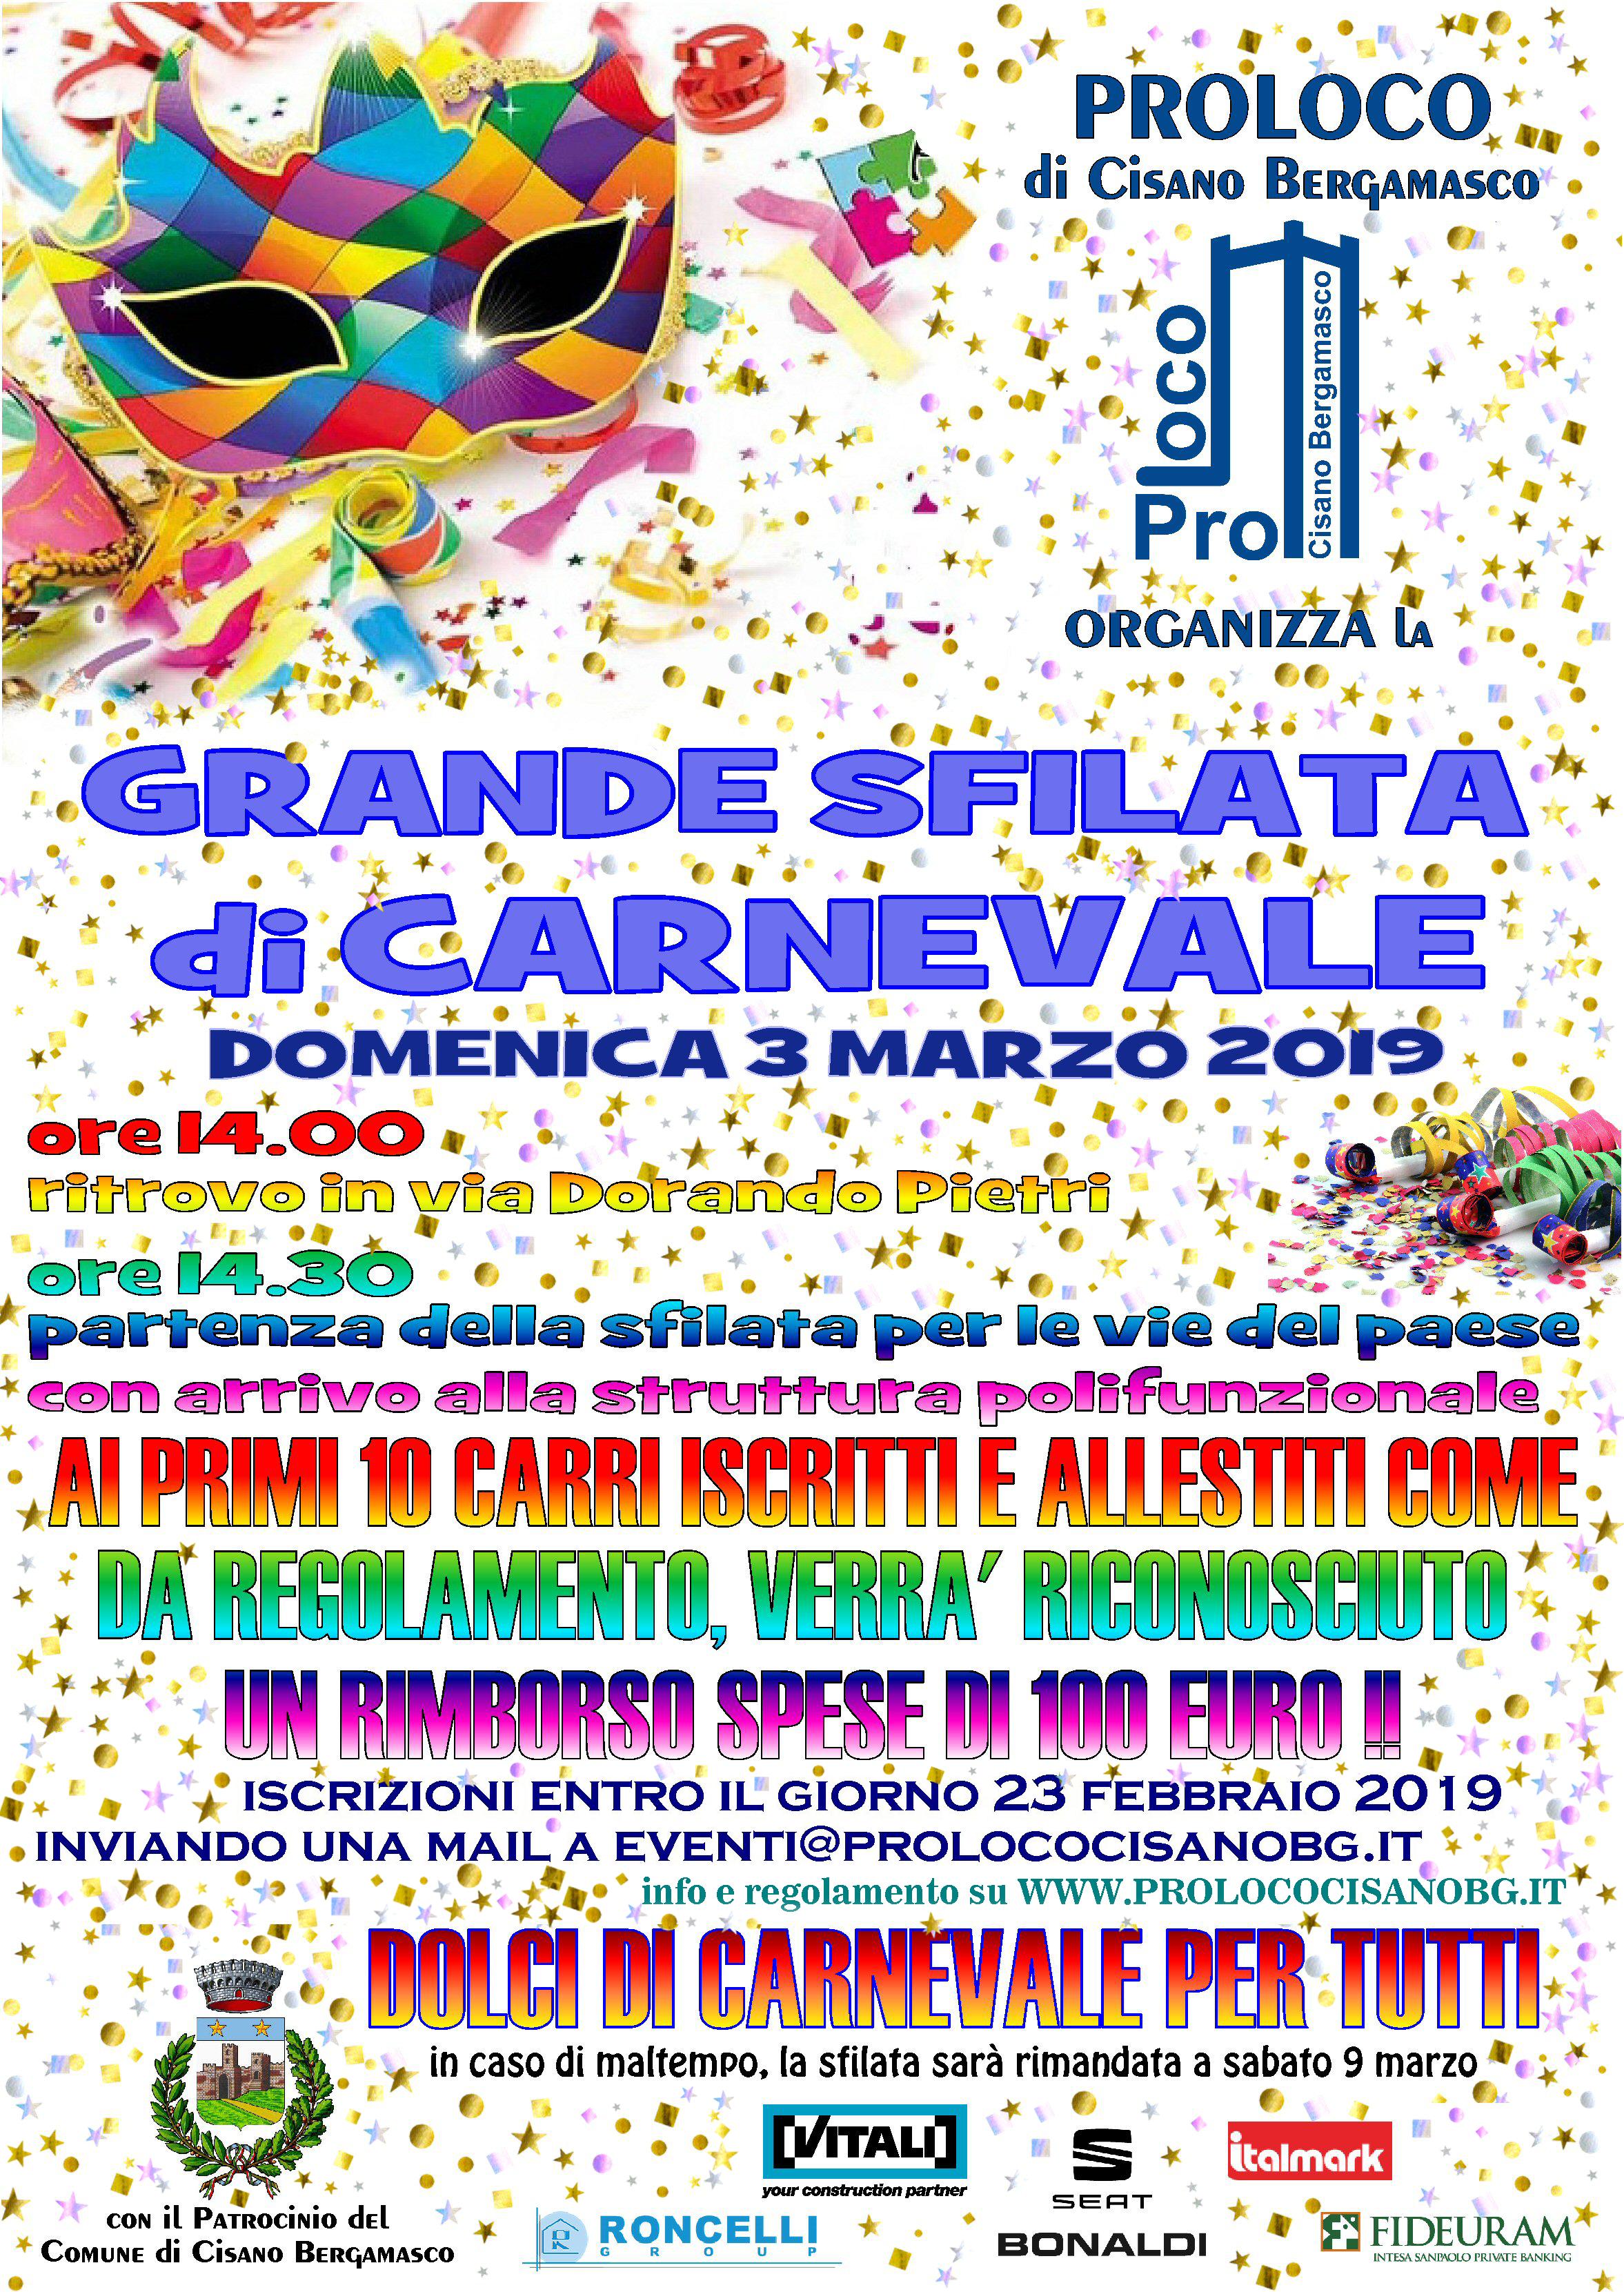 Grande Sfilata di Carnevale 2019